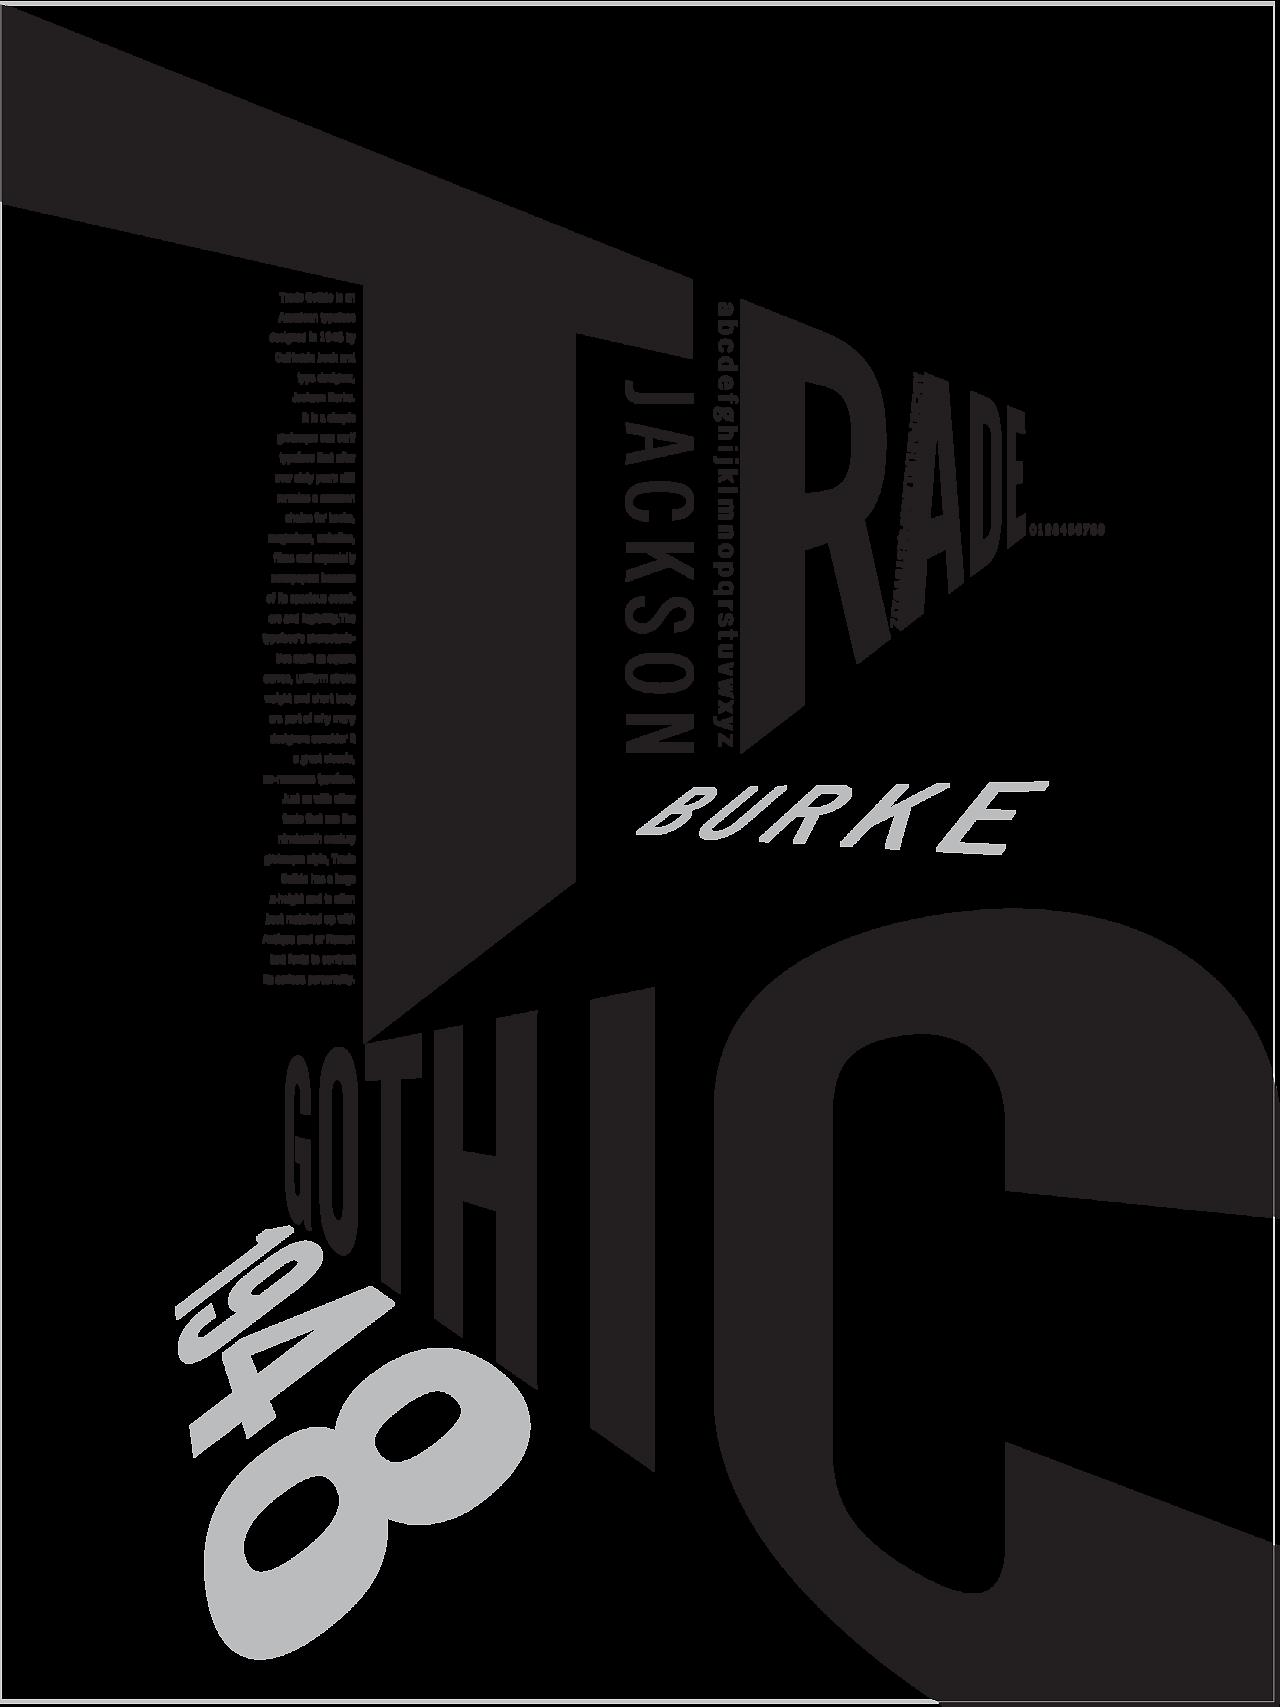 #communication #inspired #designed #gothic #poster #design #trade #pnca #byTrade Gothic inspired poster designed by PNCA... | PNCA Communication Design #posterdesigns